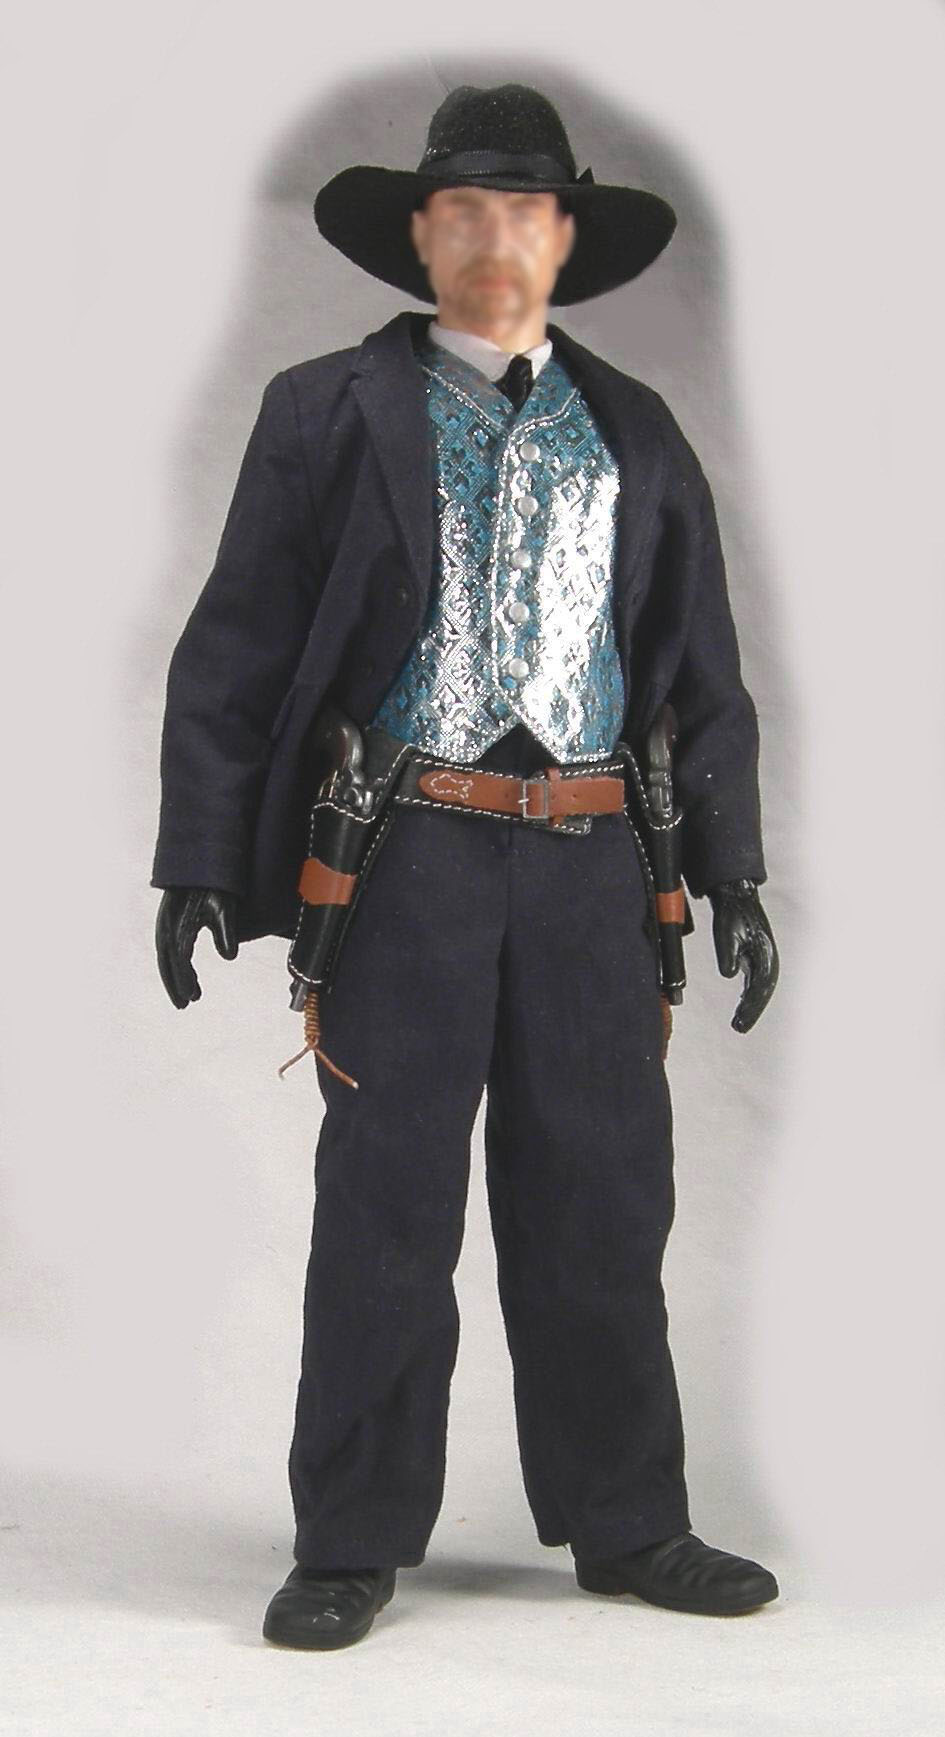 1//6 Battle Gear Toys Gilet Cowboy Gambler 508 01 Argenté Waistcoat Western